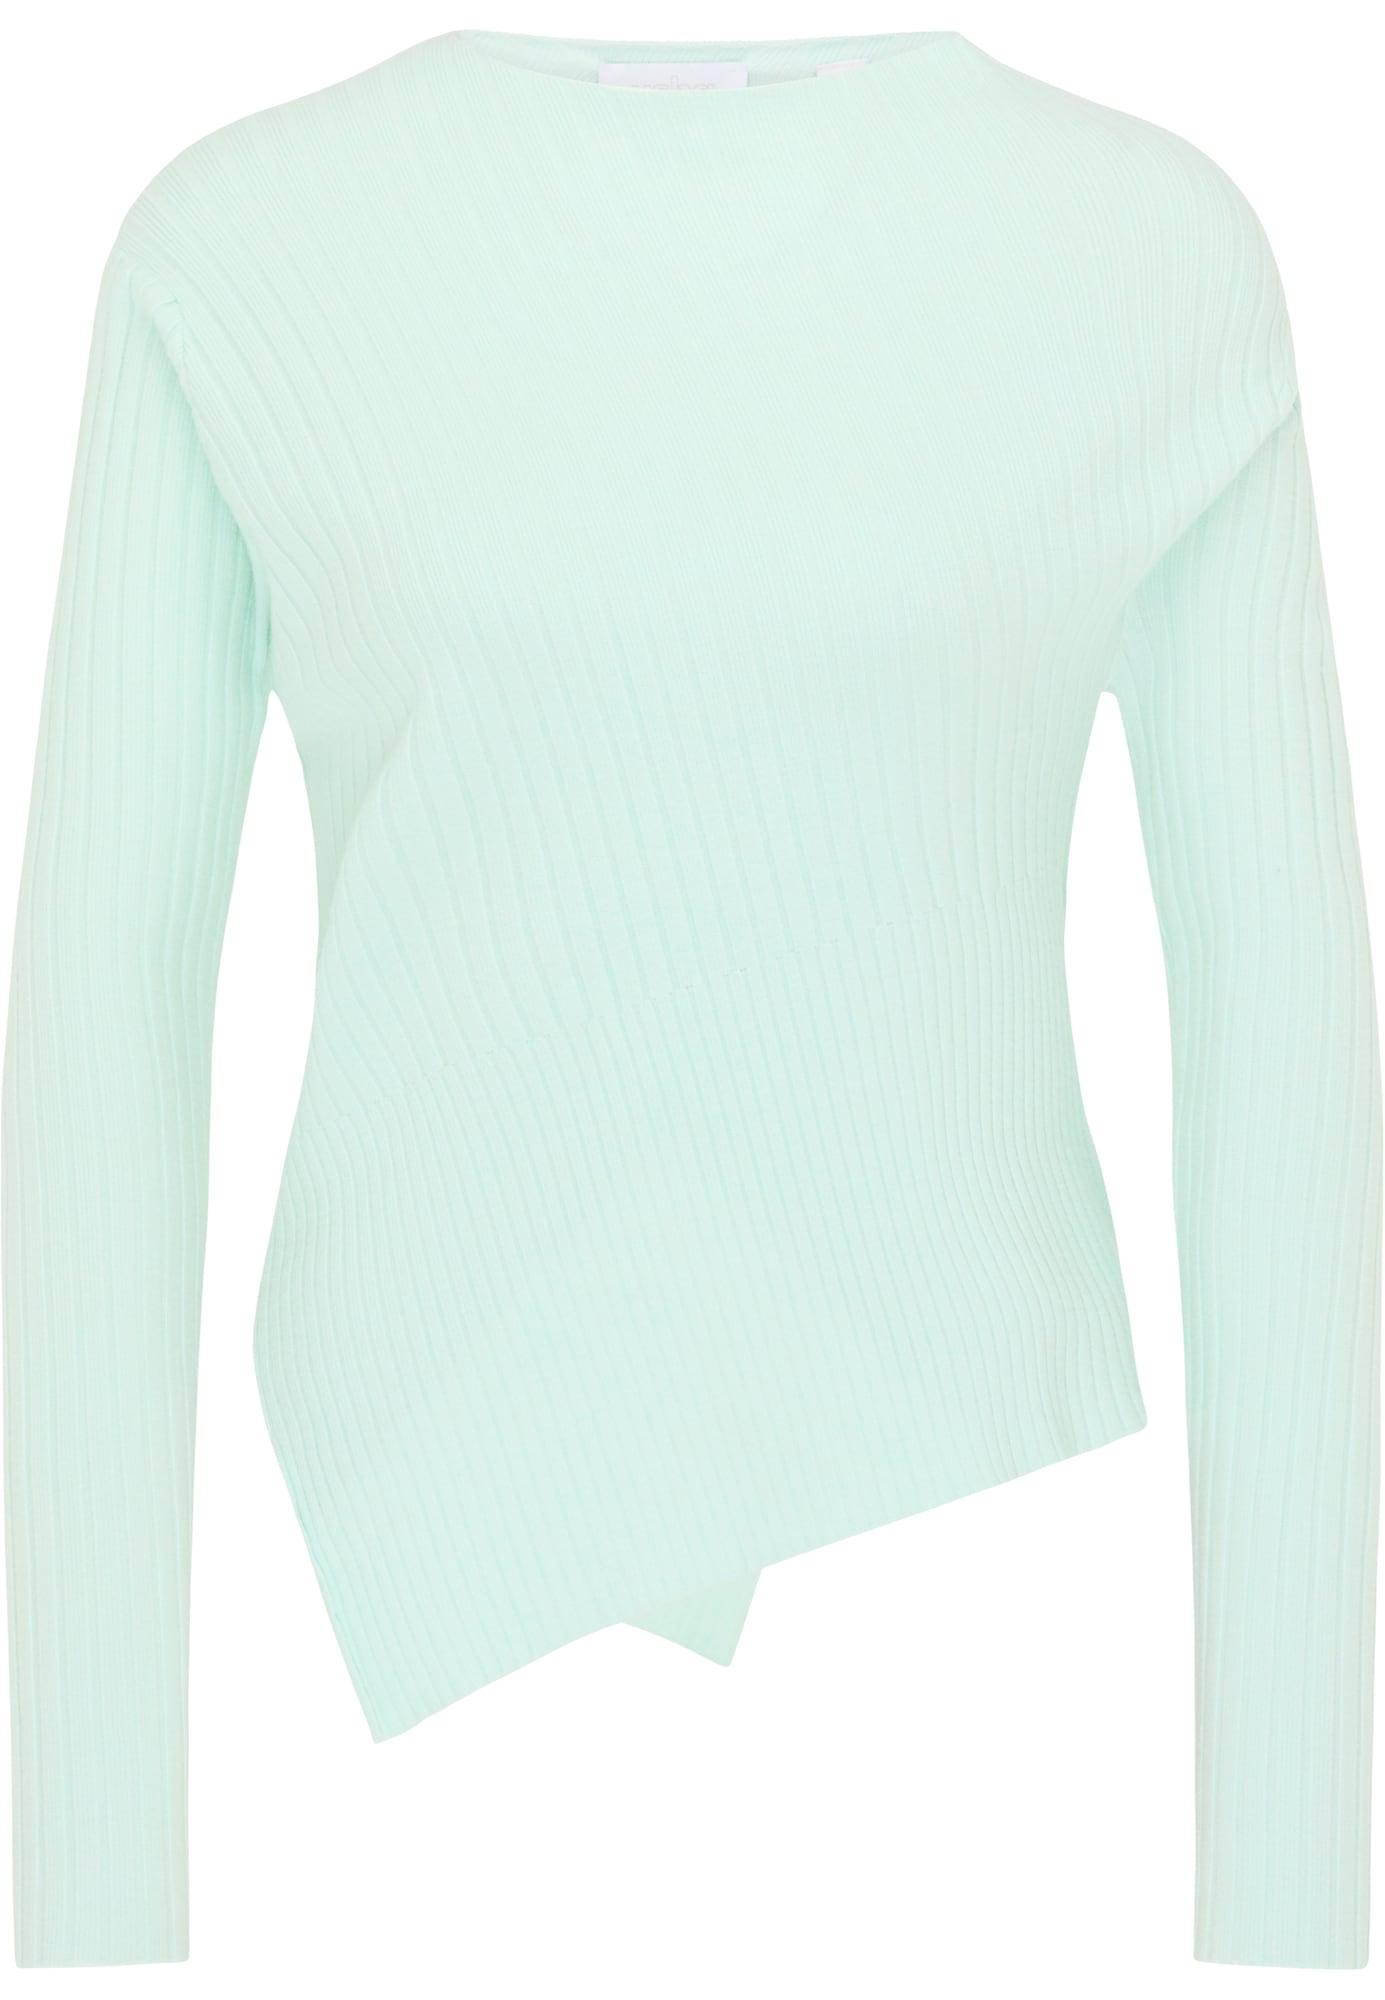 usha WHITE LABEL Megztinis pastelinė žalia